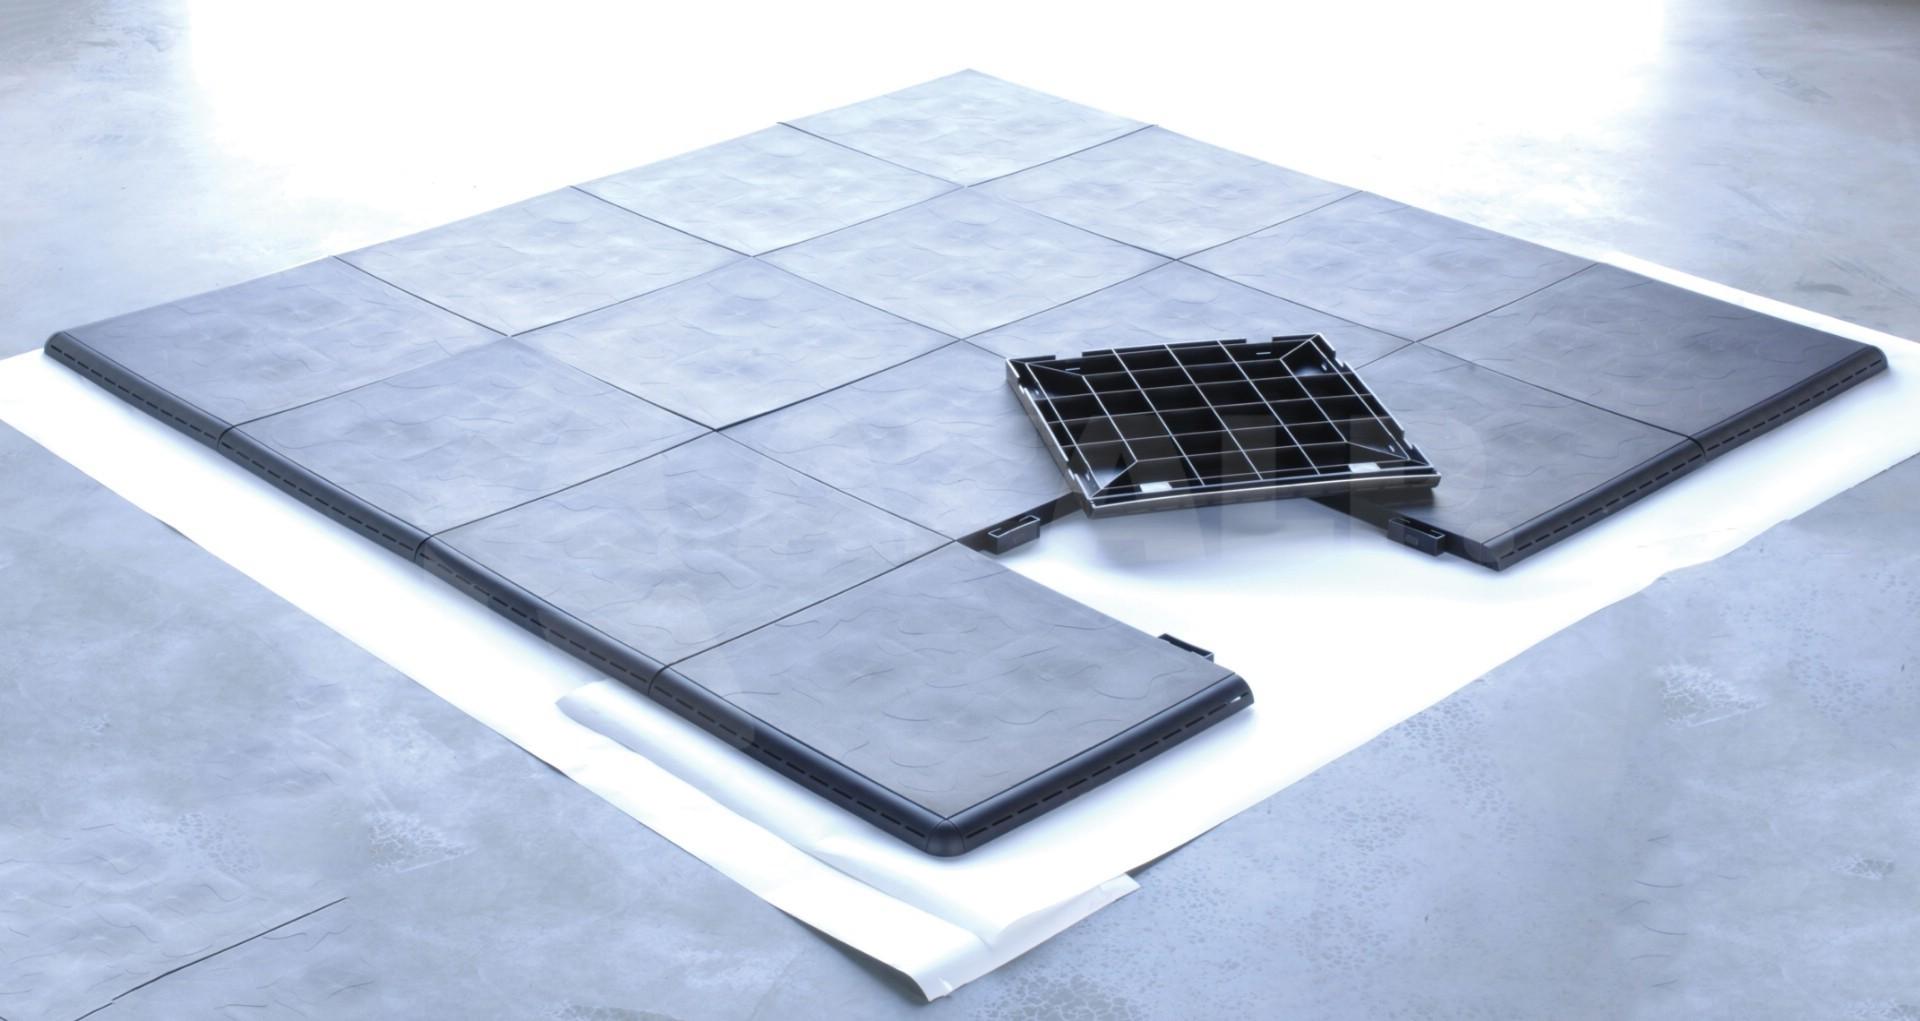 leisure concepts smartdeck mit trimkit 2 4 x 2 4 m kaufen bei. Black Bedroom Furniture Sets. Home Design Ideas